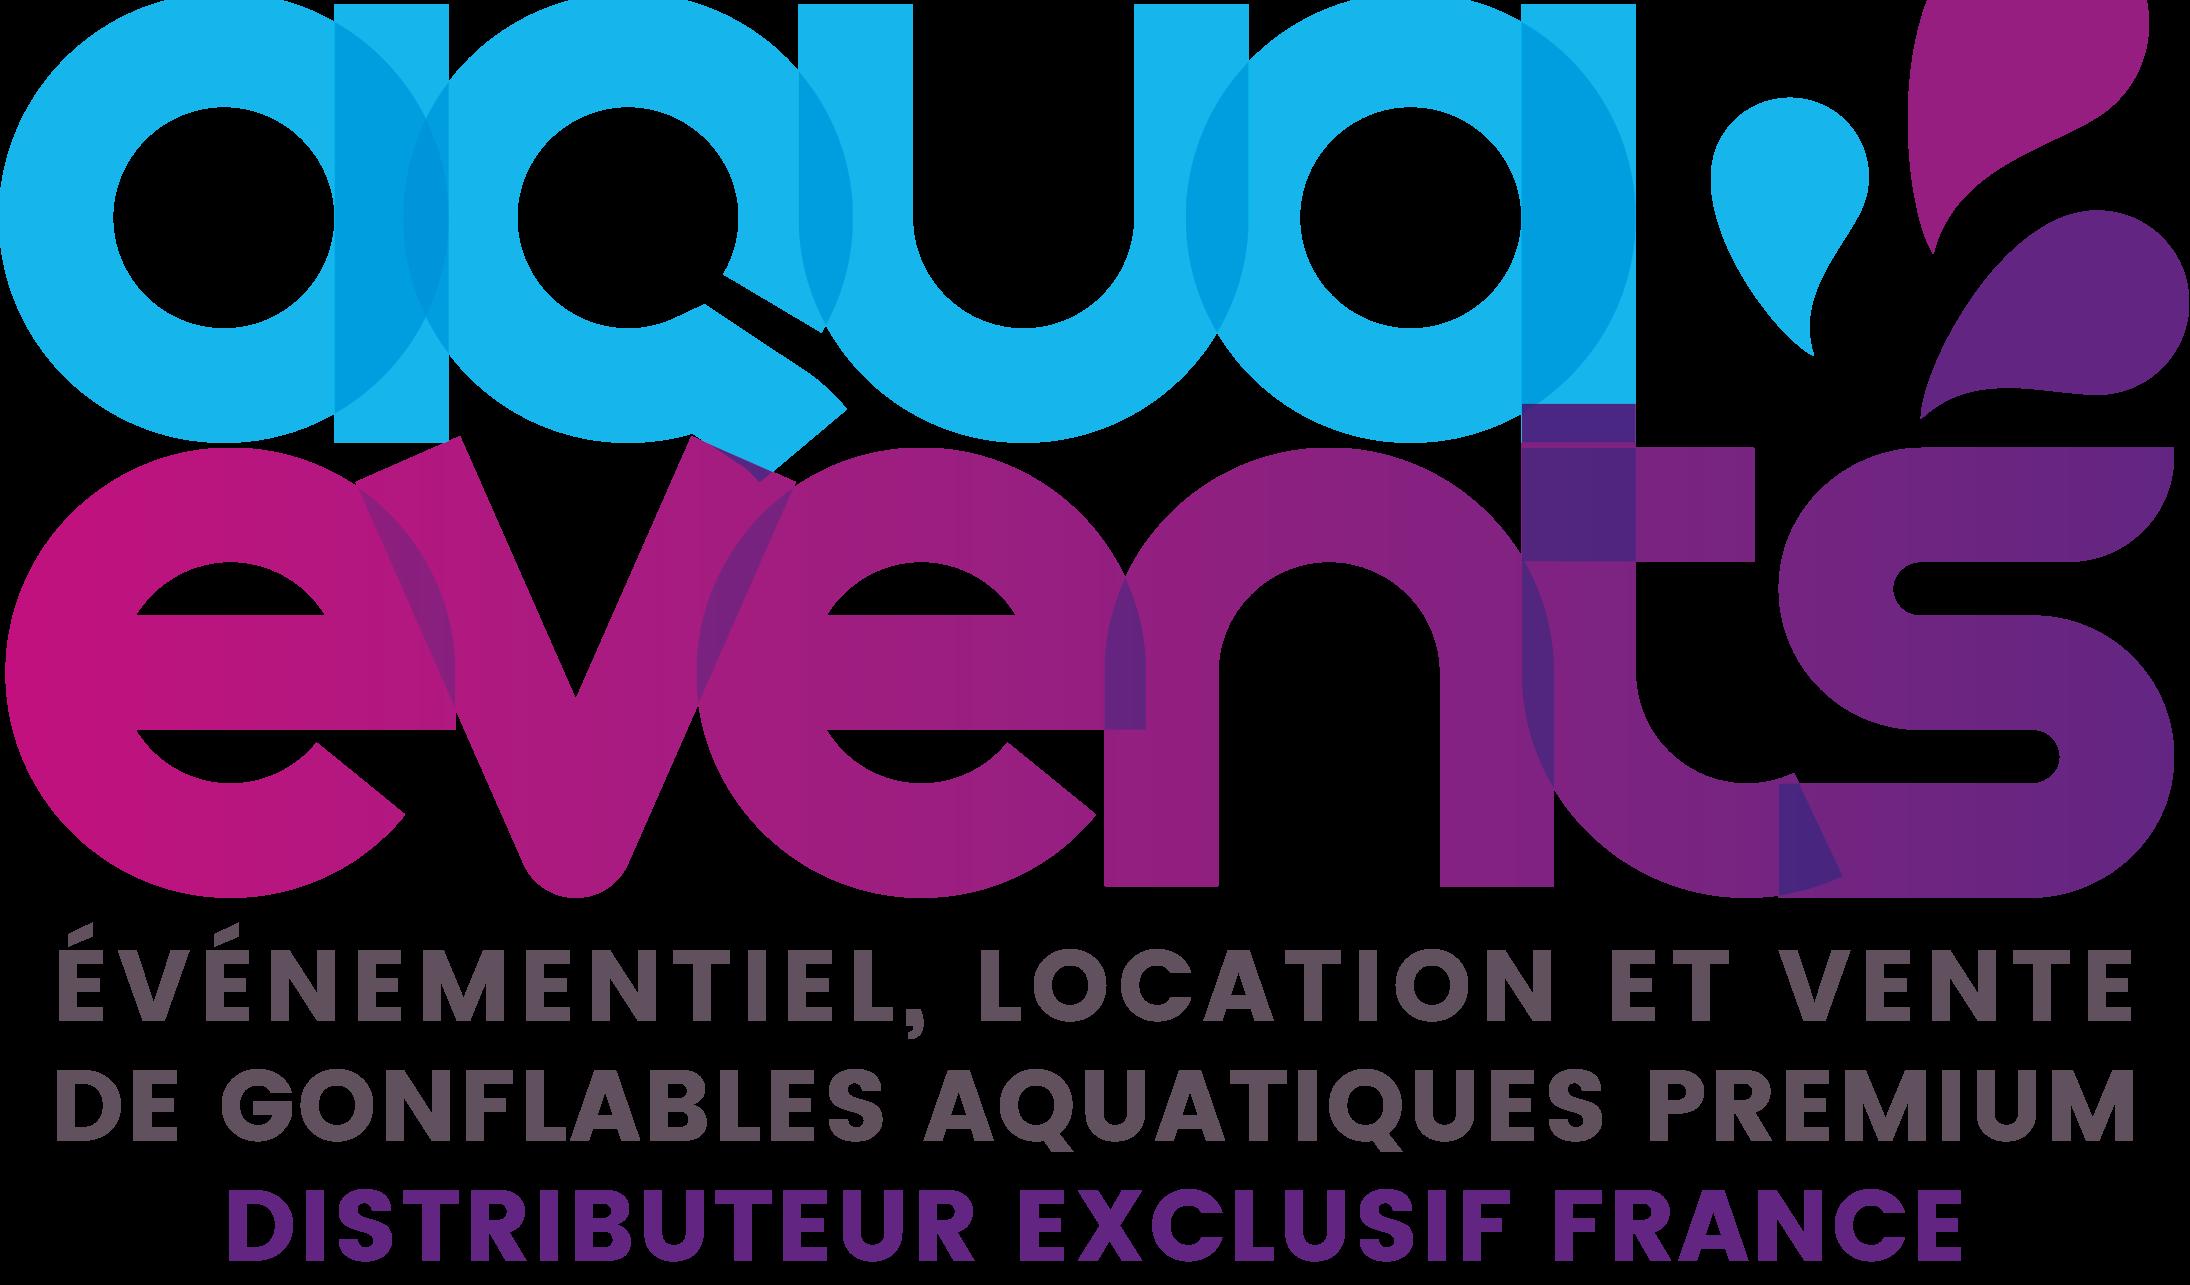 AquaEvents-logo location distributeur exclusif france violet